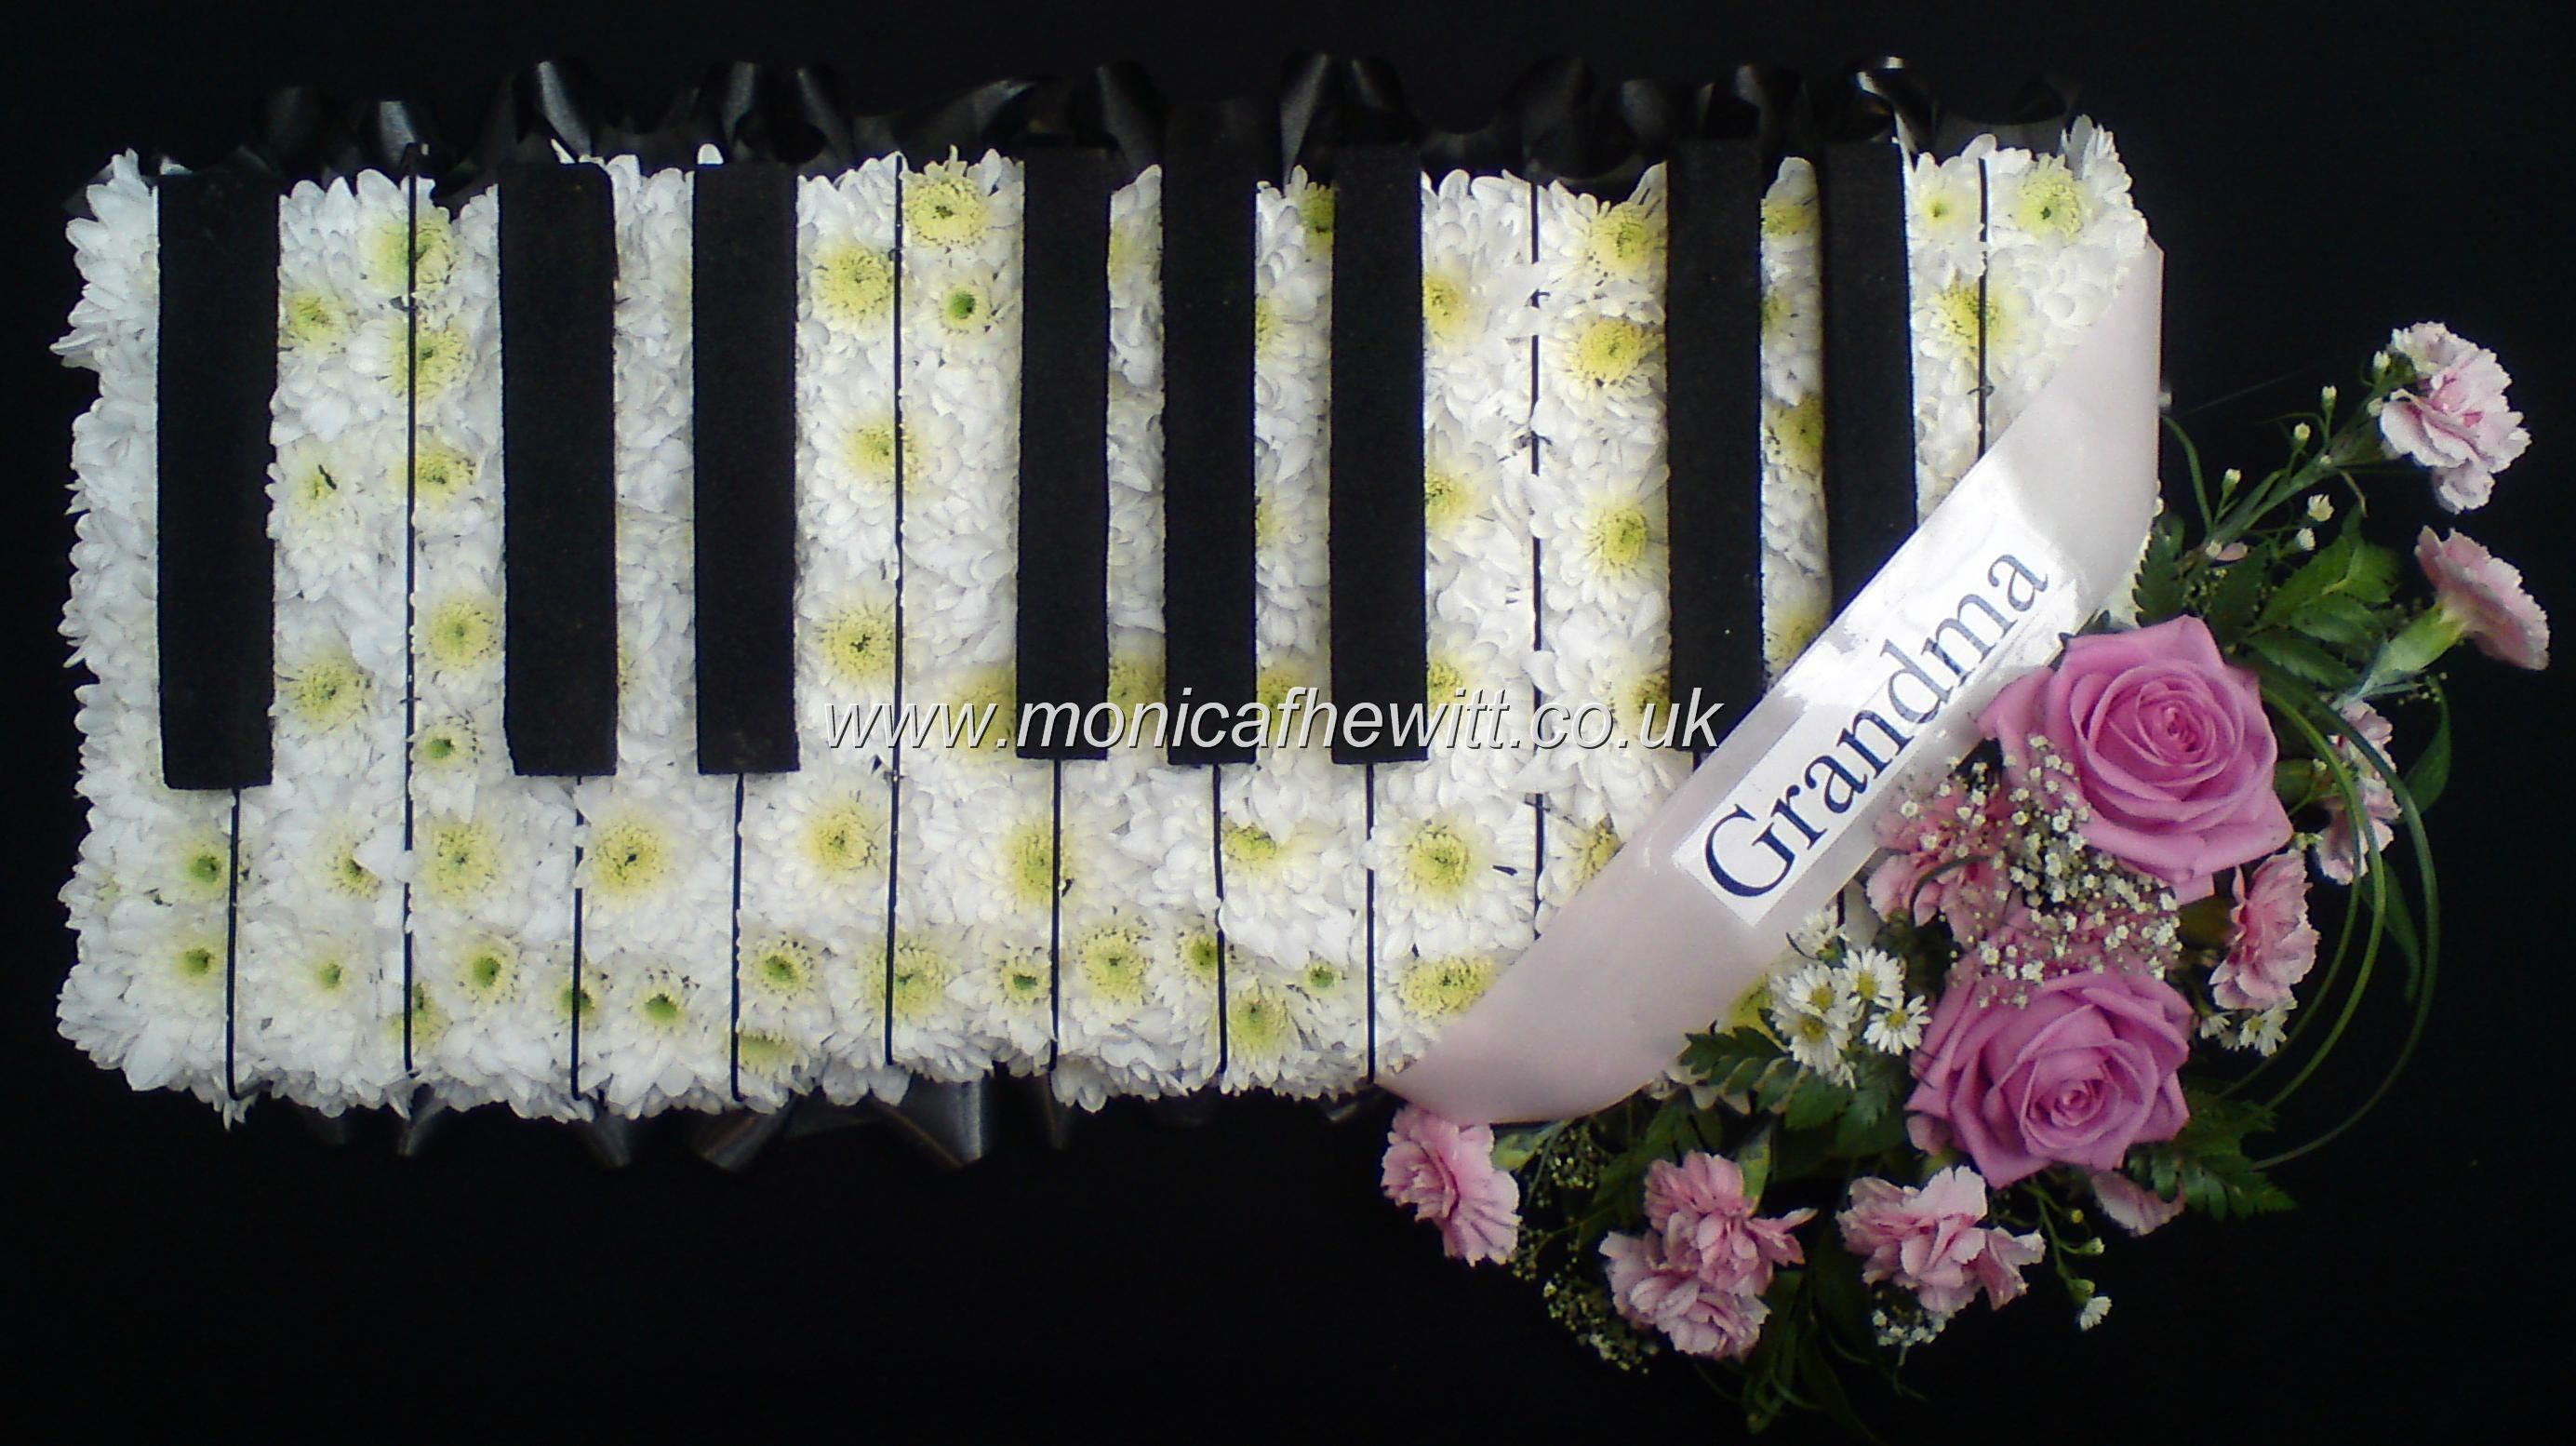 Piano octave funeral flowers monica f hewitt florist sheffield piano octave funeral flowers monica f hewitt florist sheffield izmirmasajfo